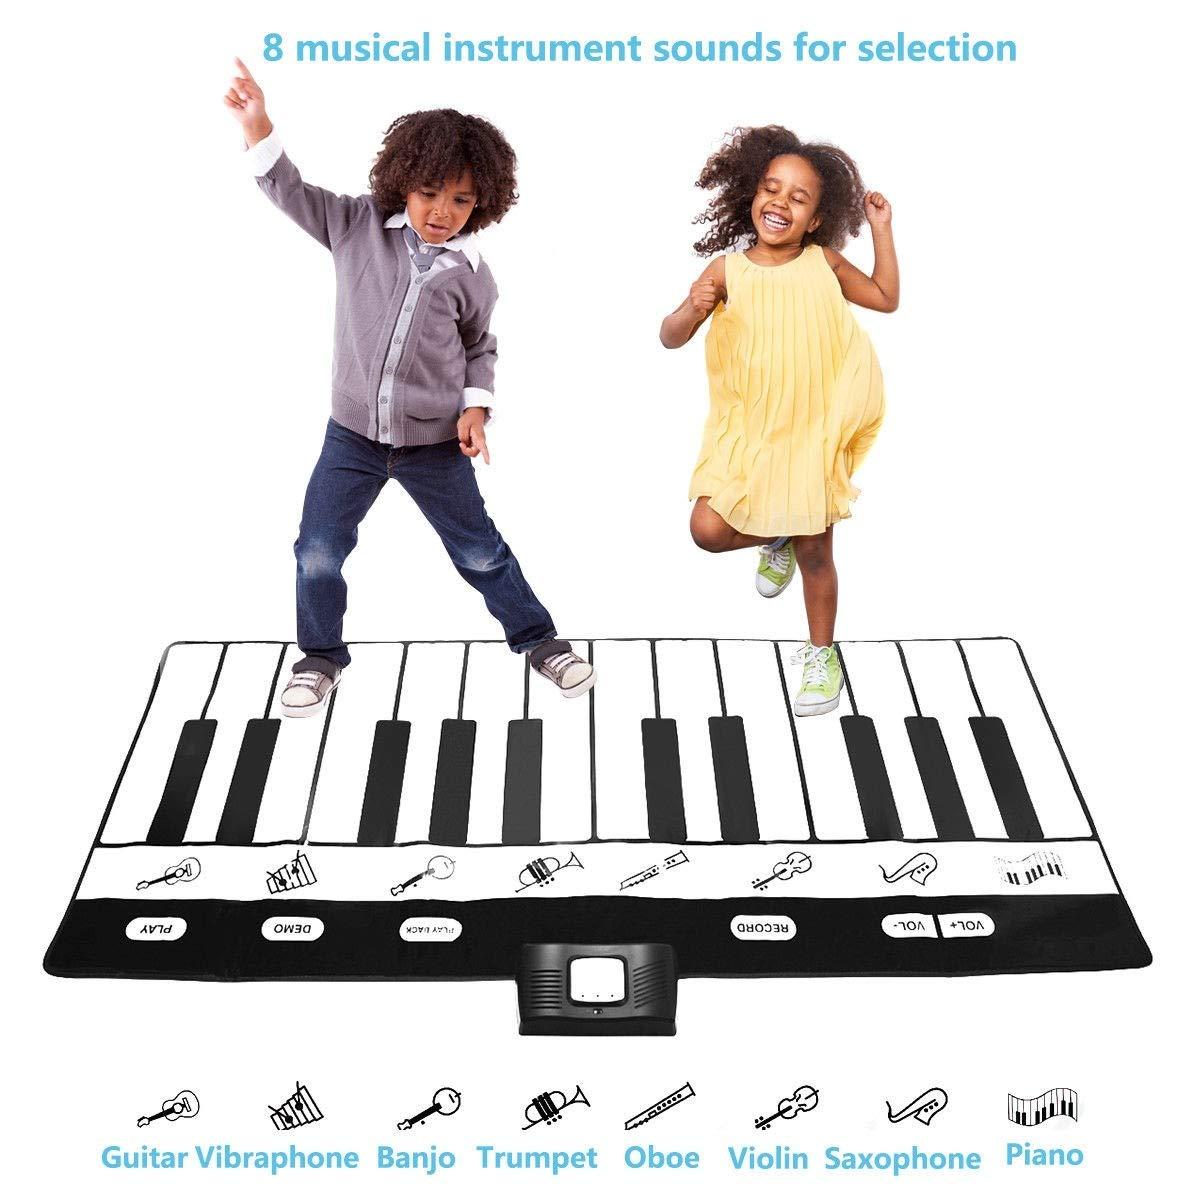 Dayanaprincess New Kids 24 Key Gigantic Piano Keyboard with 8 Instrument Settings Learning Children Play Set Fun Entertaining Book Melody by Dayanaprincess (Image #5)